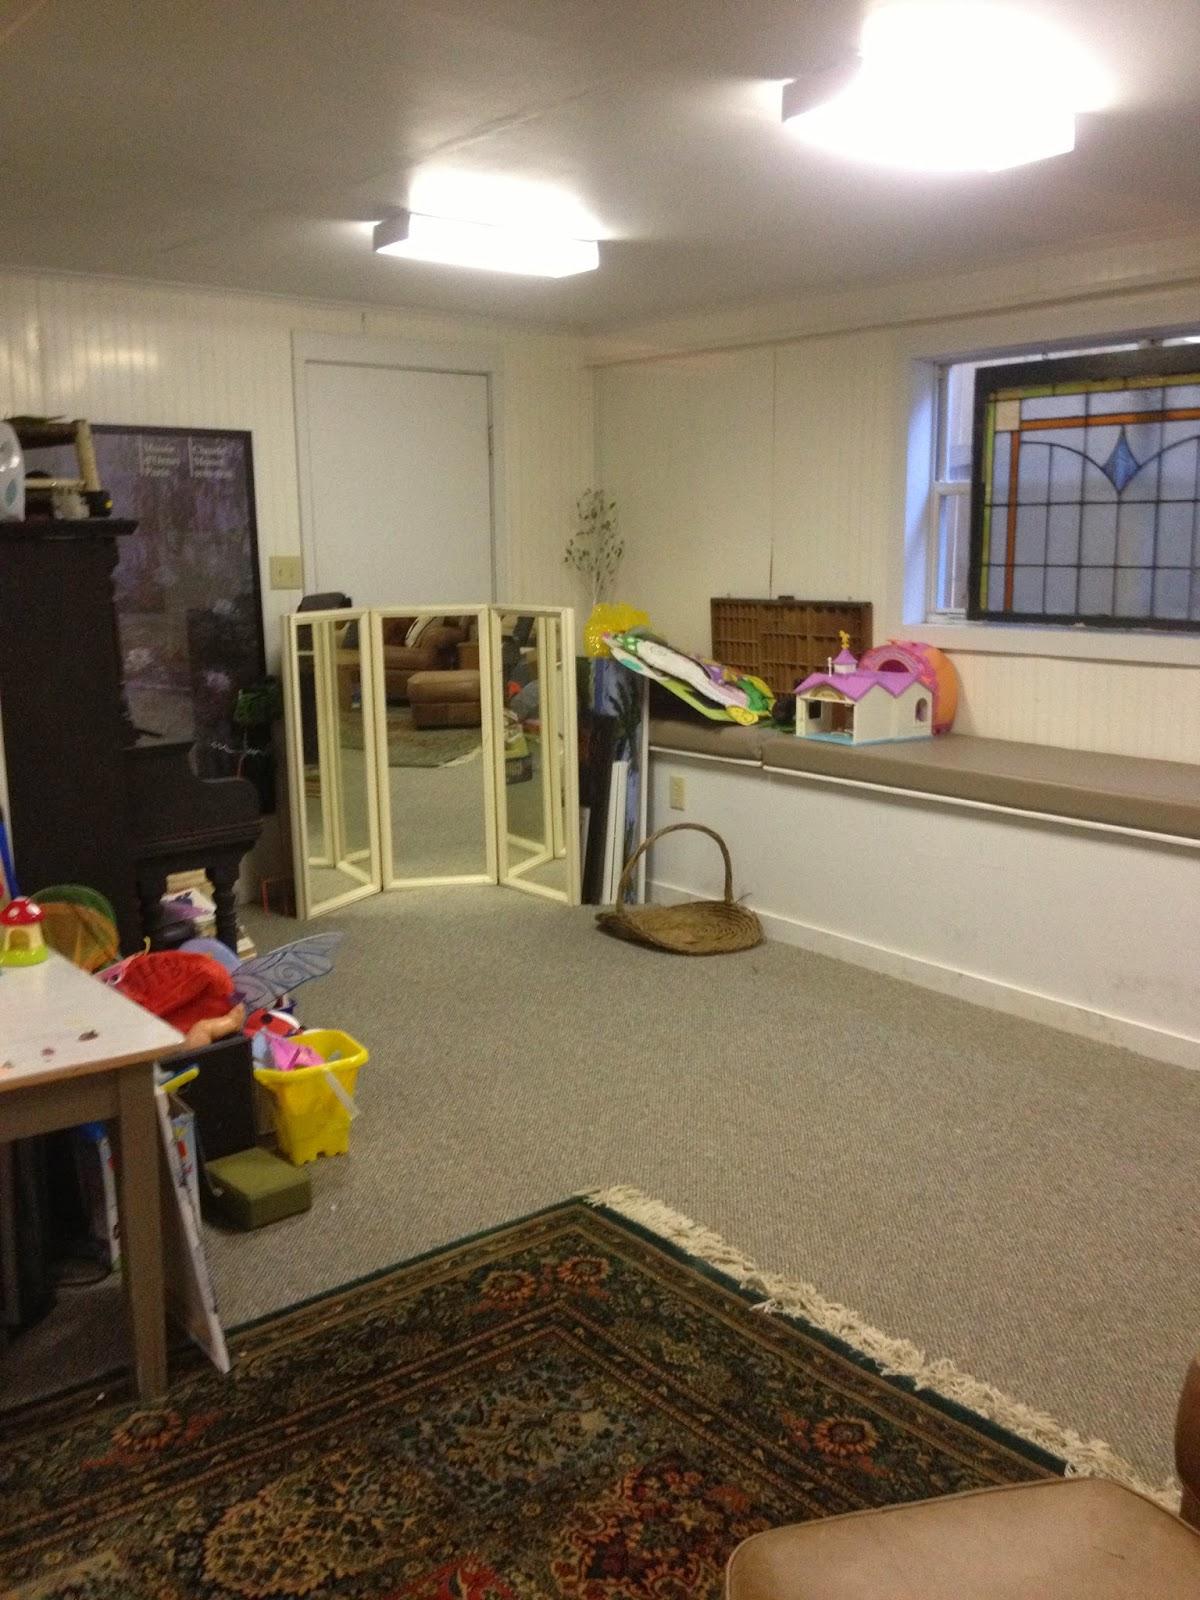 114 Fels Ave Fairhope Detached Garage Bottom Floor